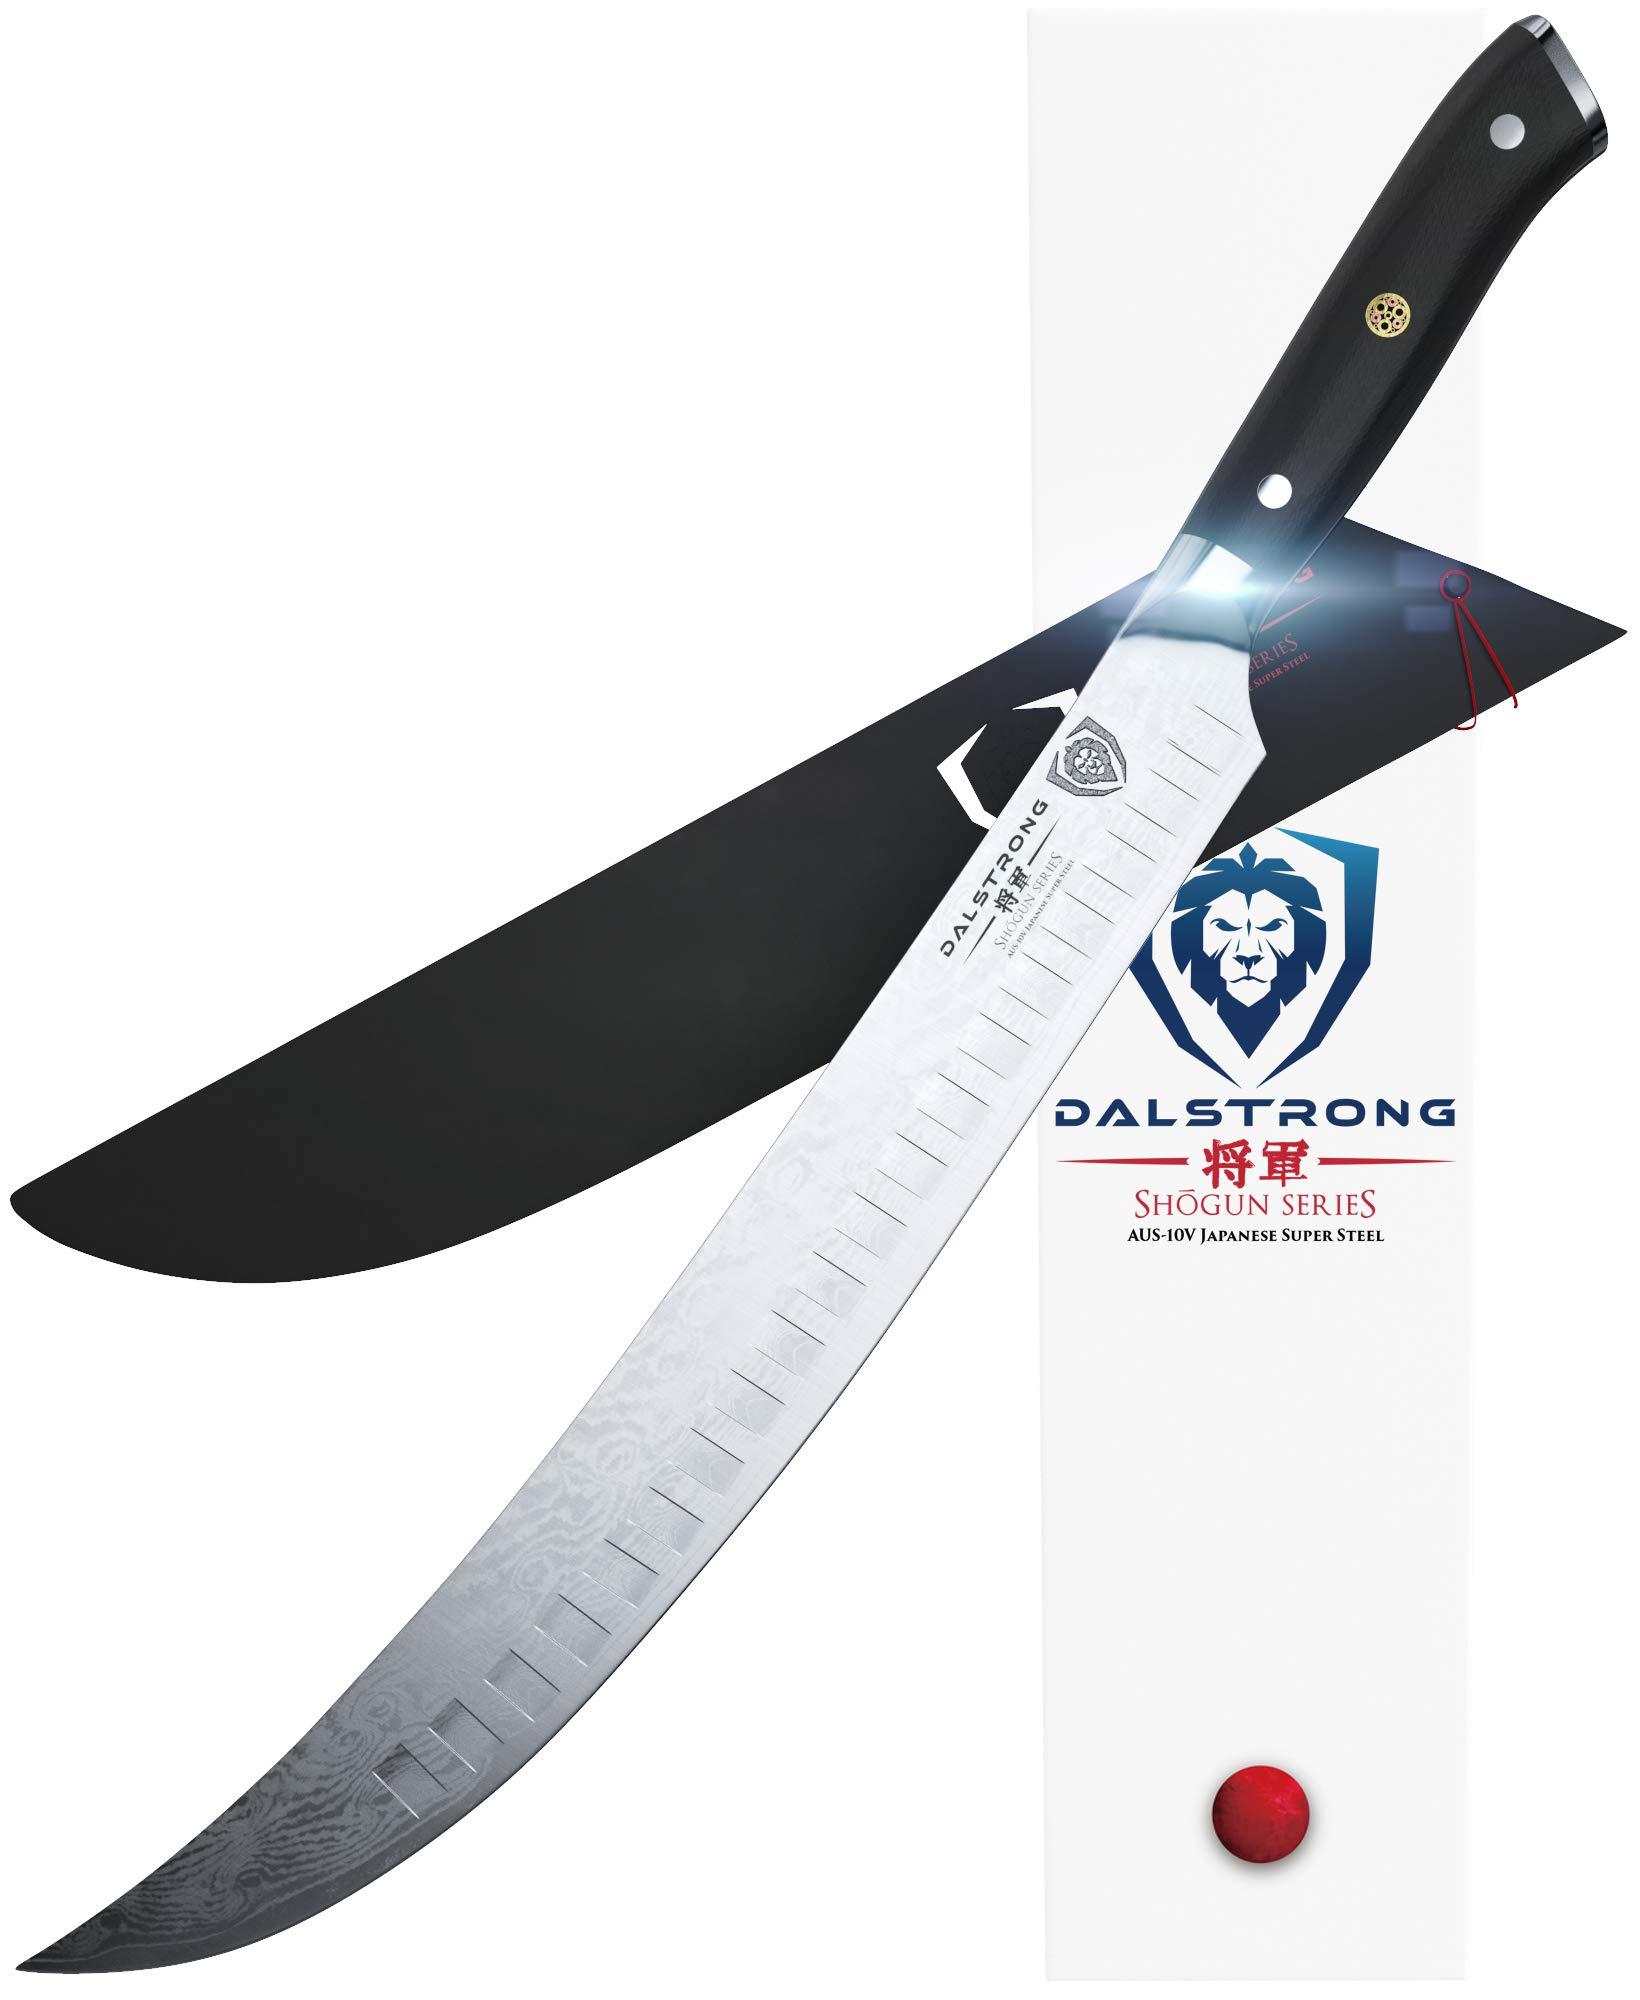 DALSTRONG Butcher's Breaking Cimitar Knife - Shogun Series - Japanese AUS-10V Super Steel - 12.5'' - w/Sheath